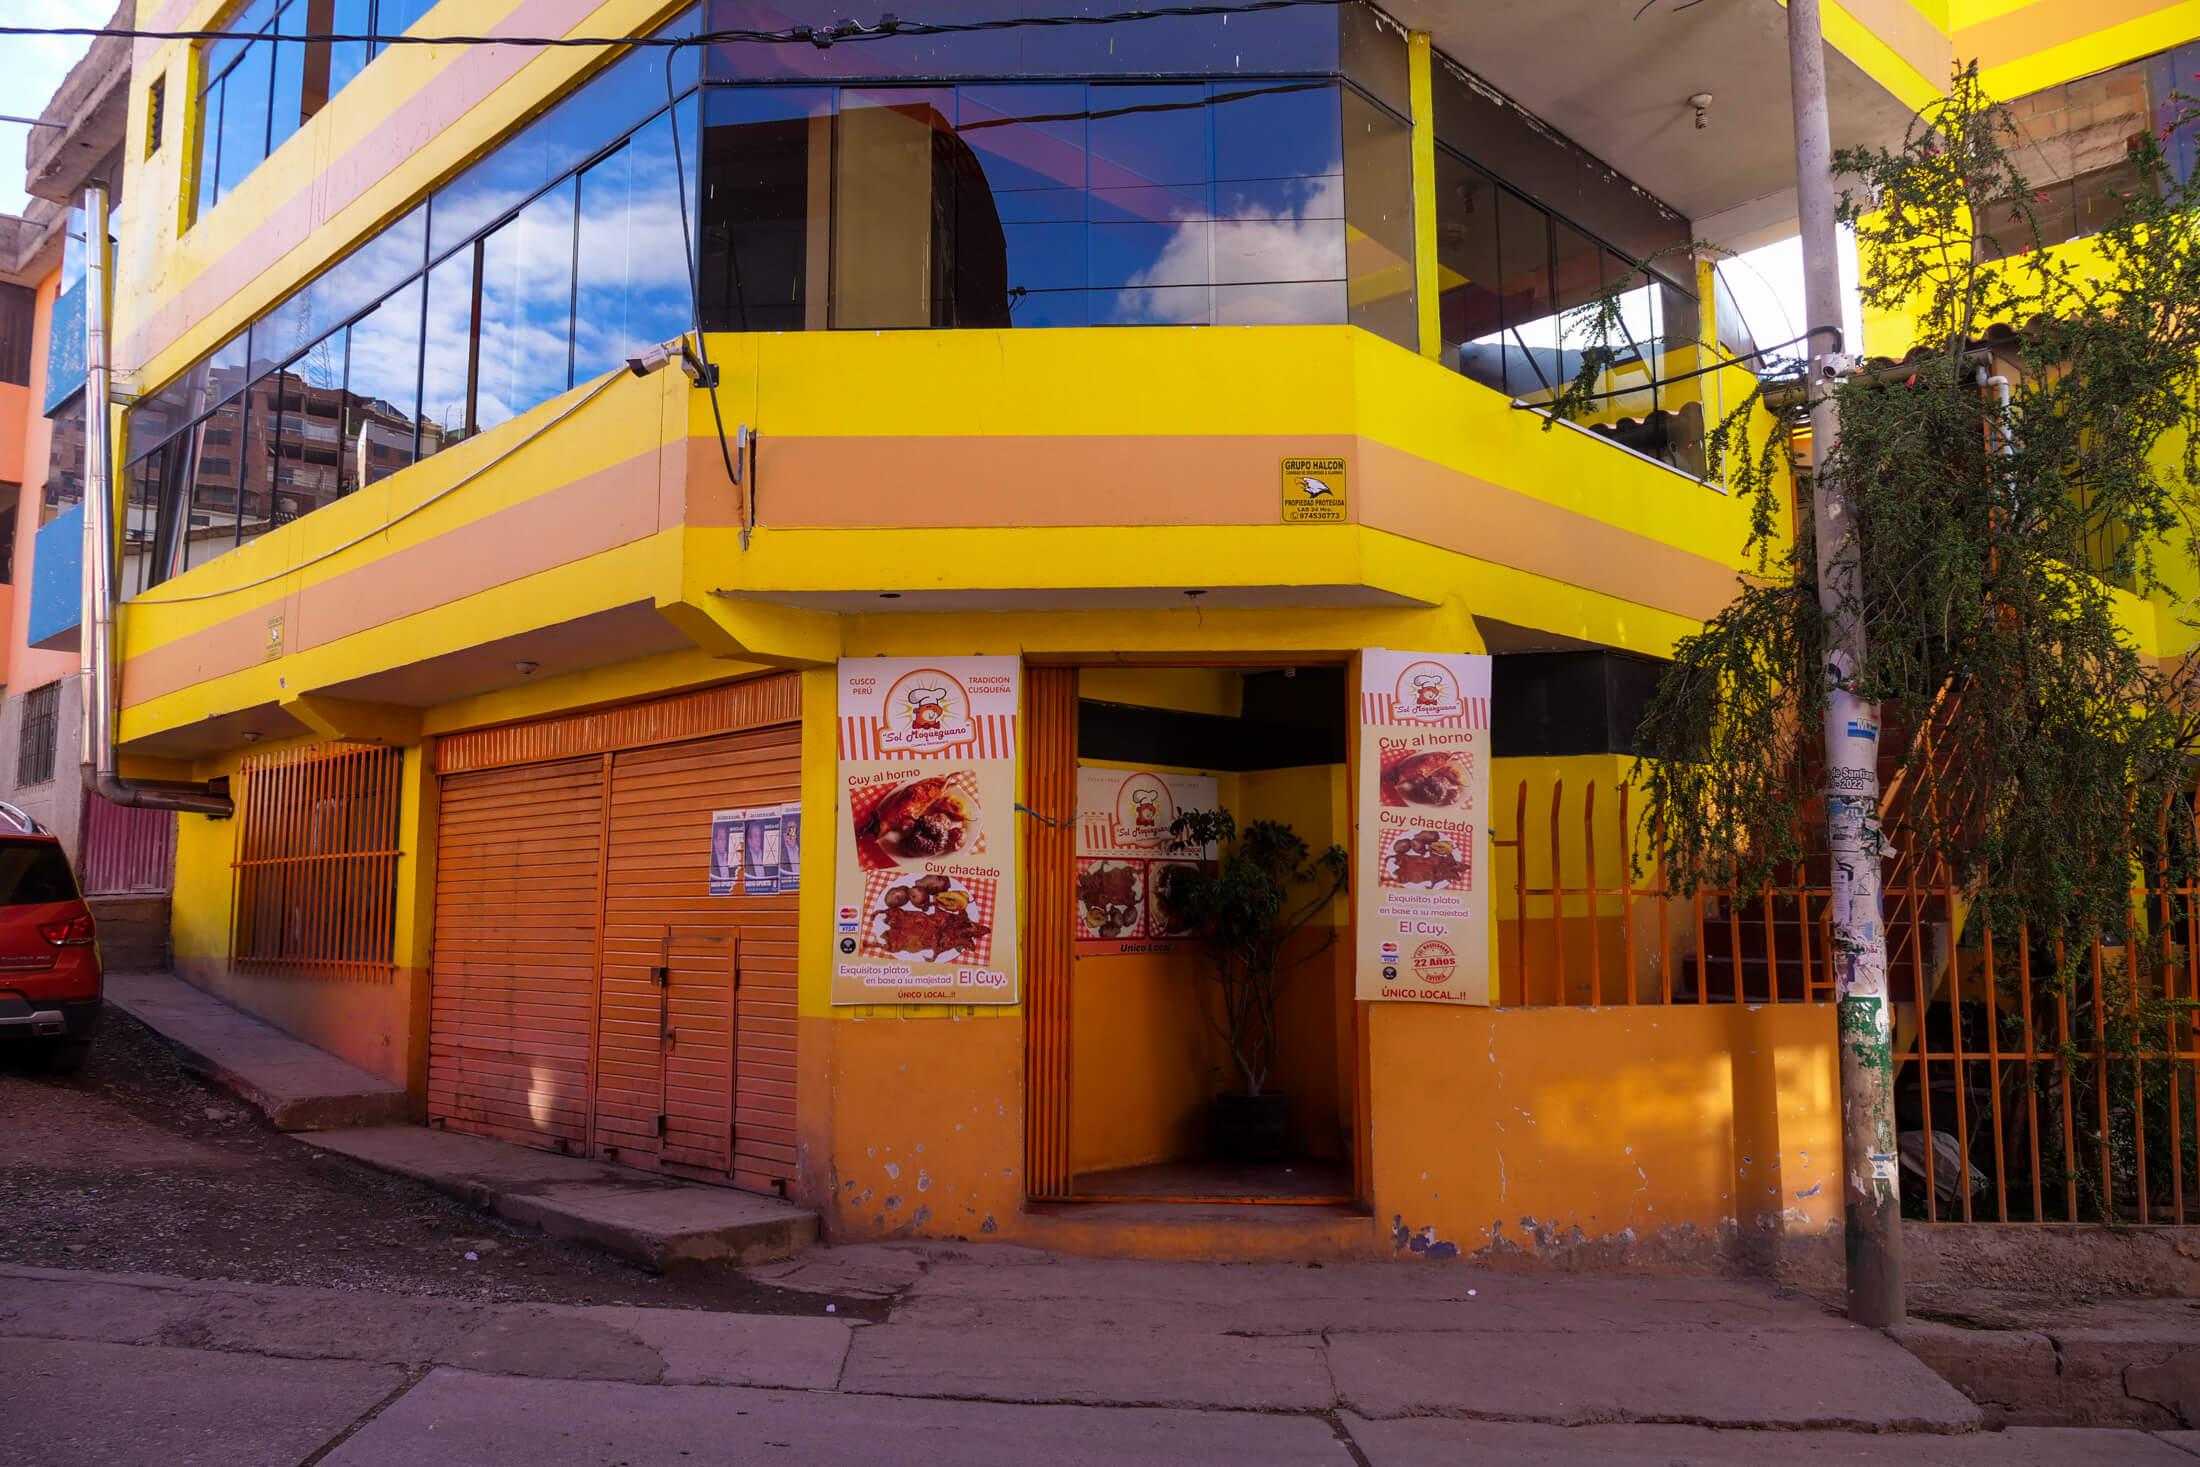 'Cuyeria Sol Moqueguano' (an amazing restarant back in Cusco)